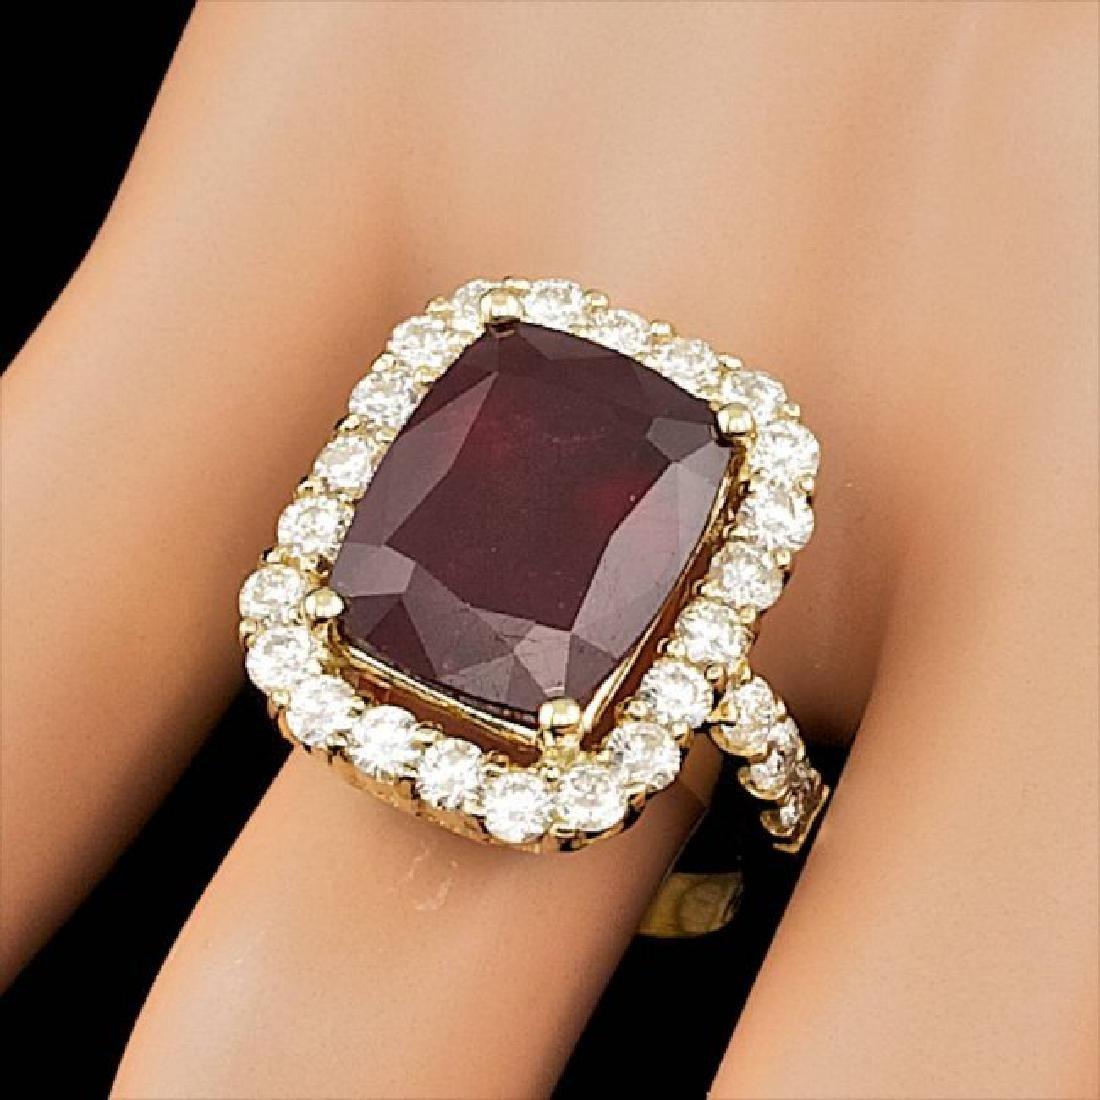 14k Yellow Gold 11.50ct Ruby 1.90ct Diamond Ring - 4